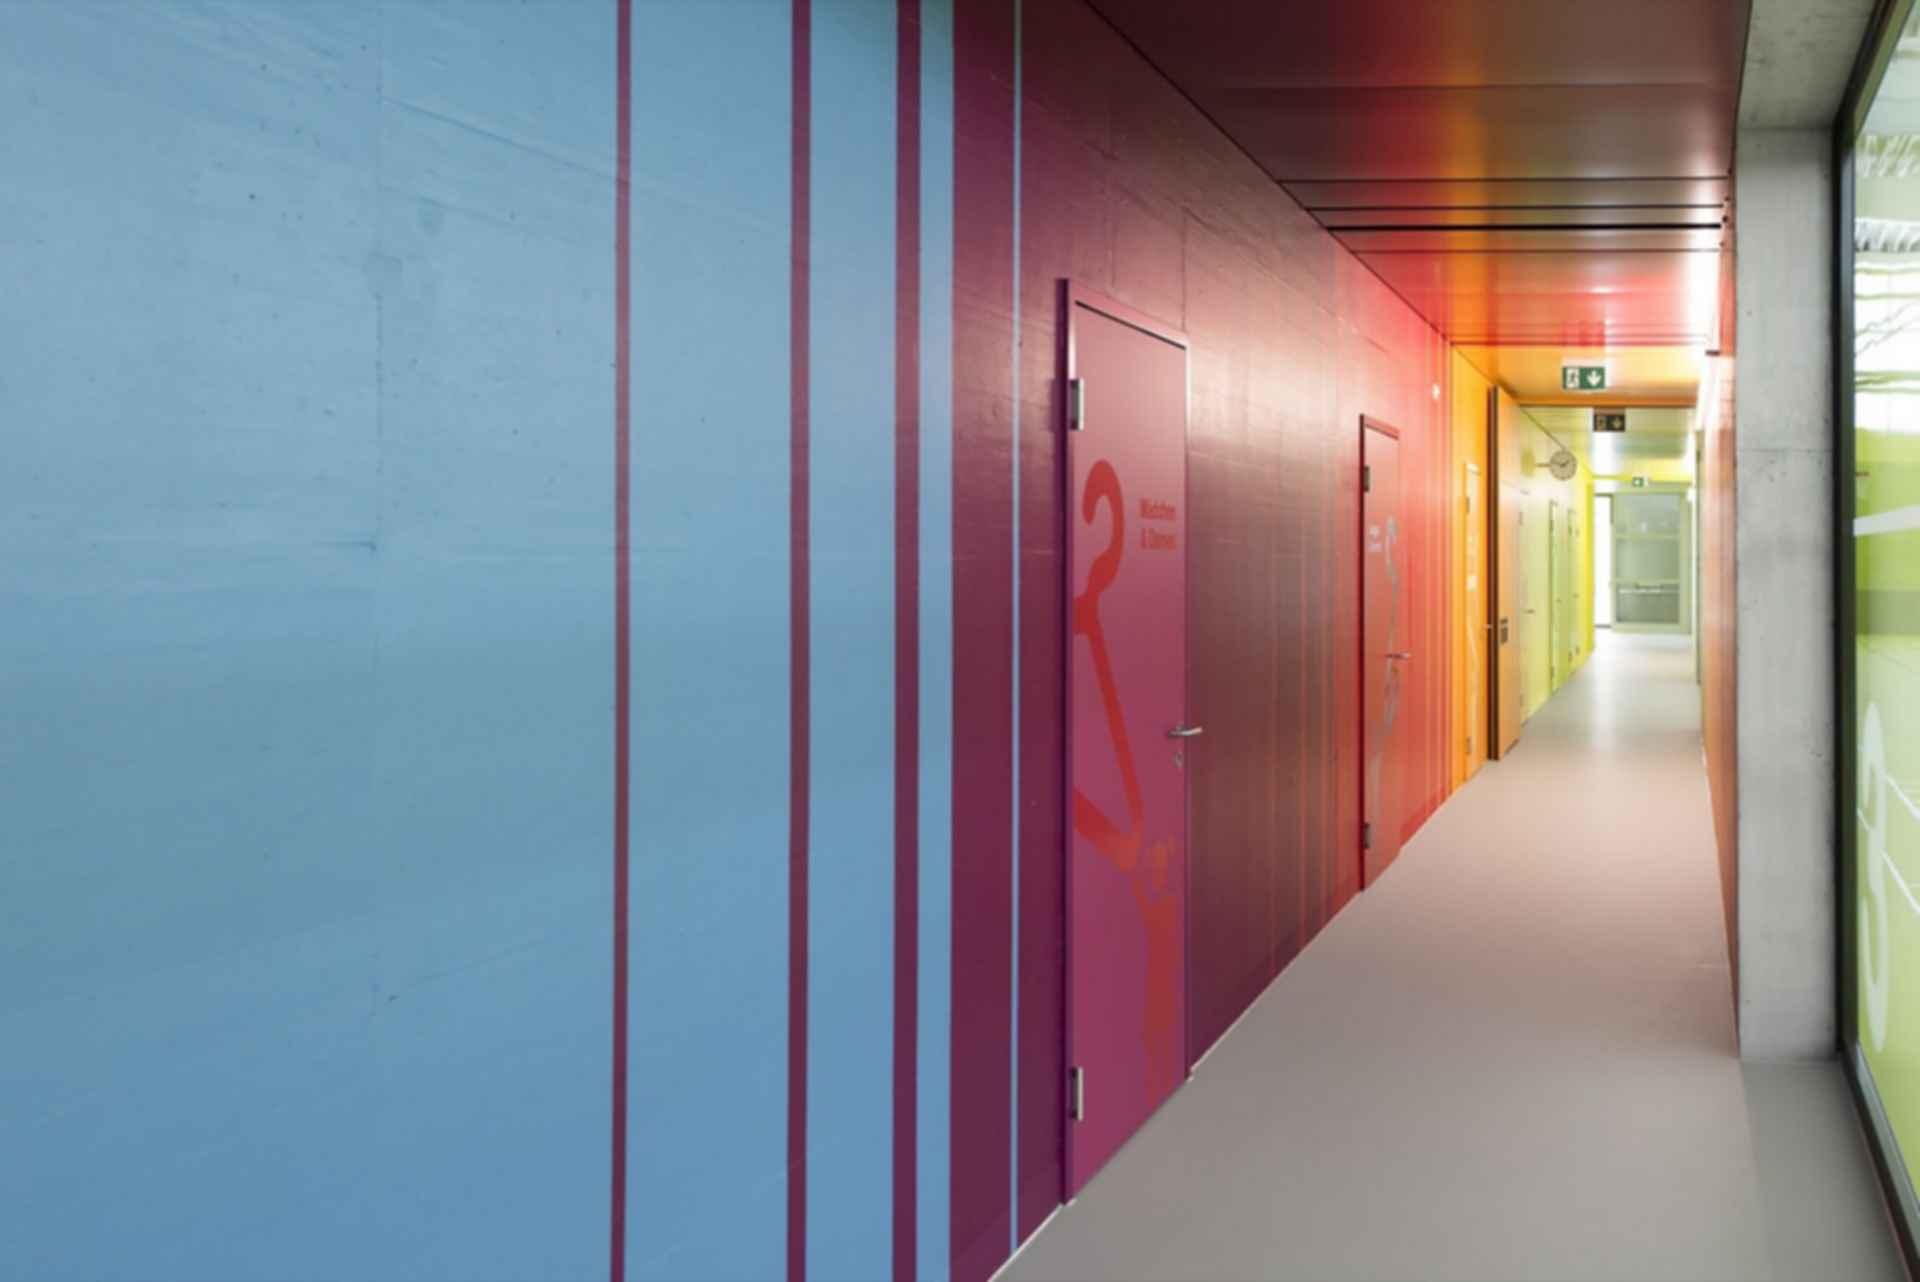 Neumatt Sports Facility - Interior Hallway